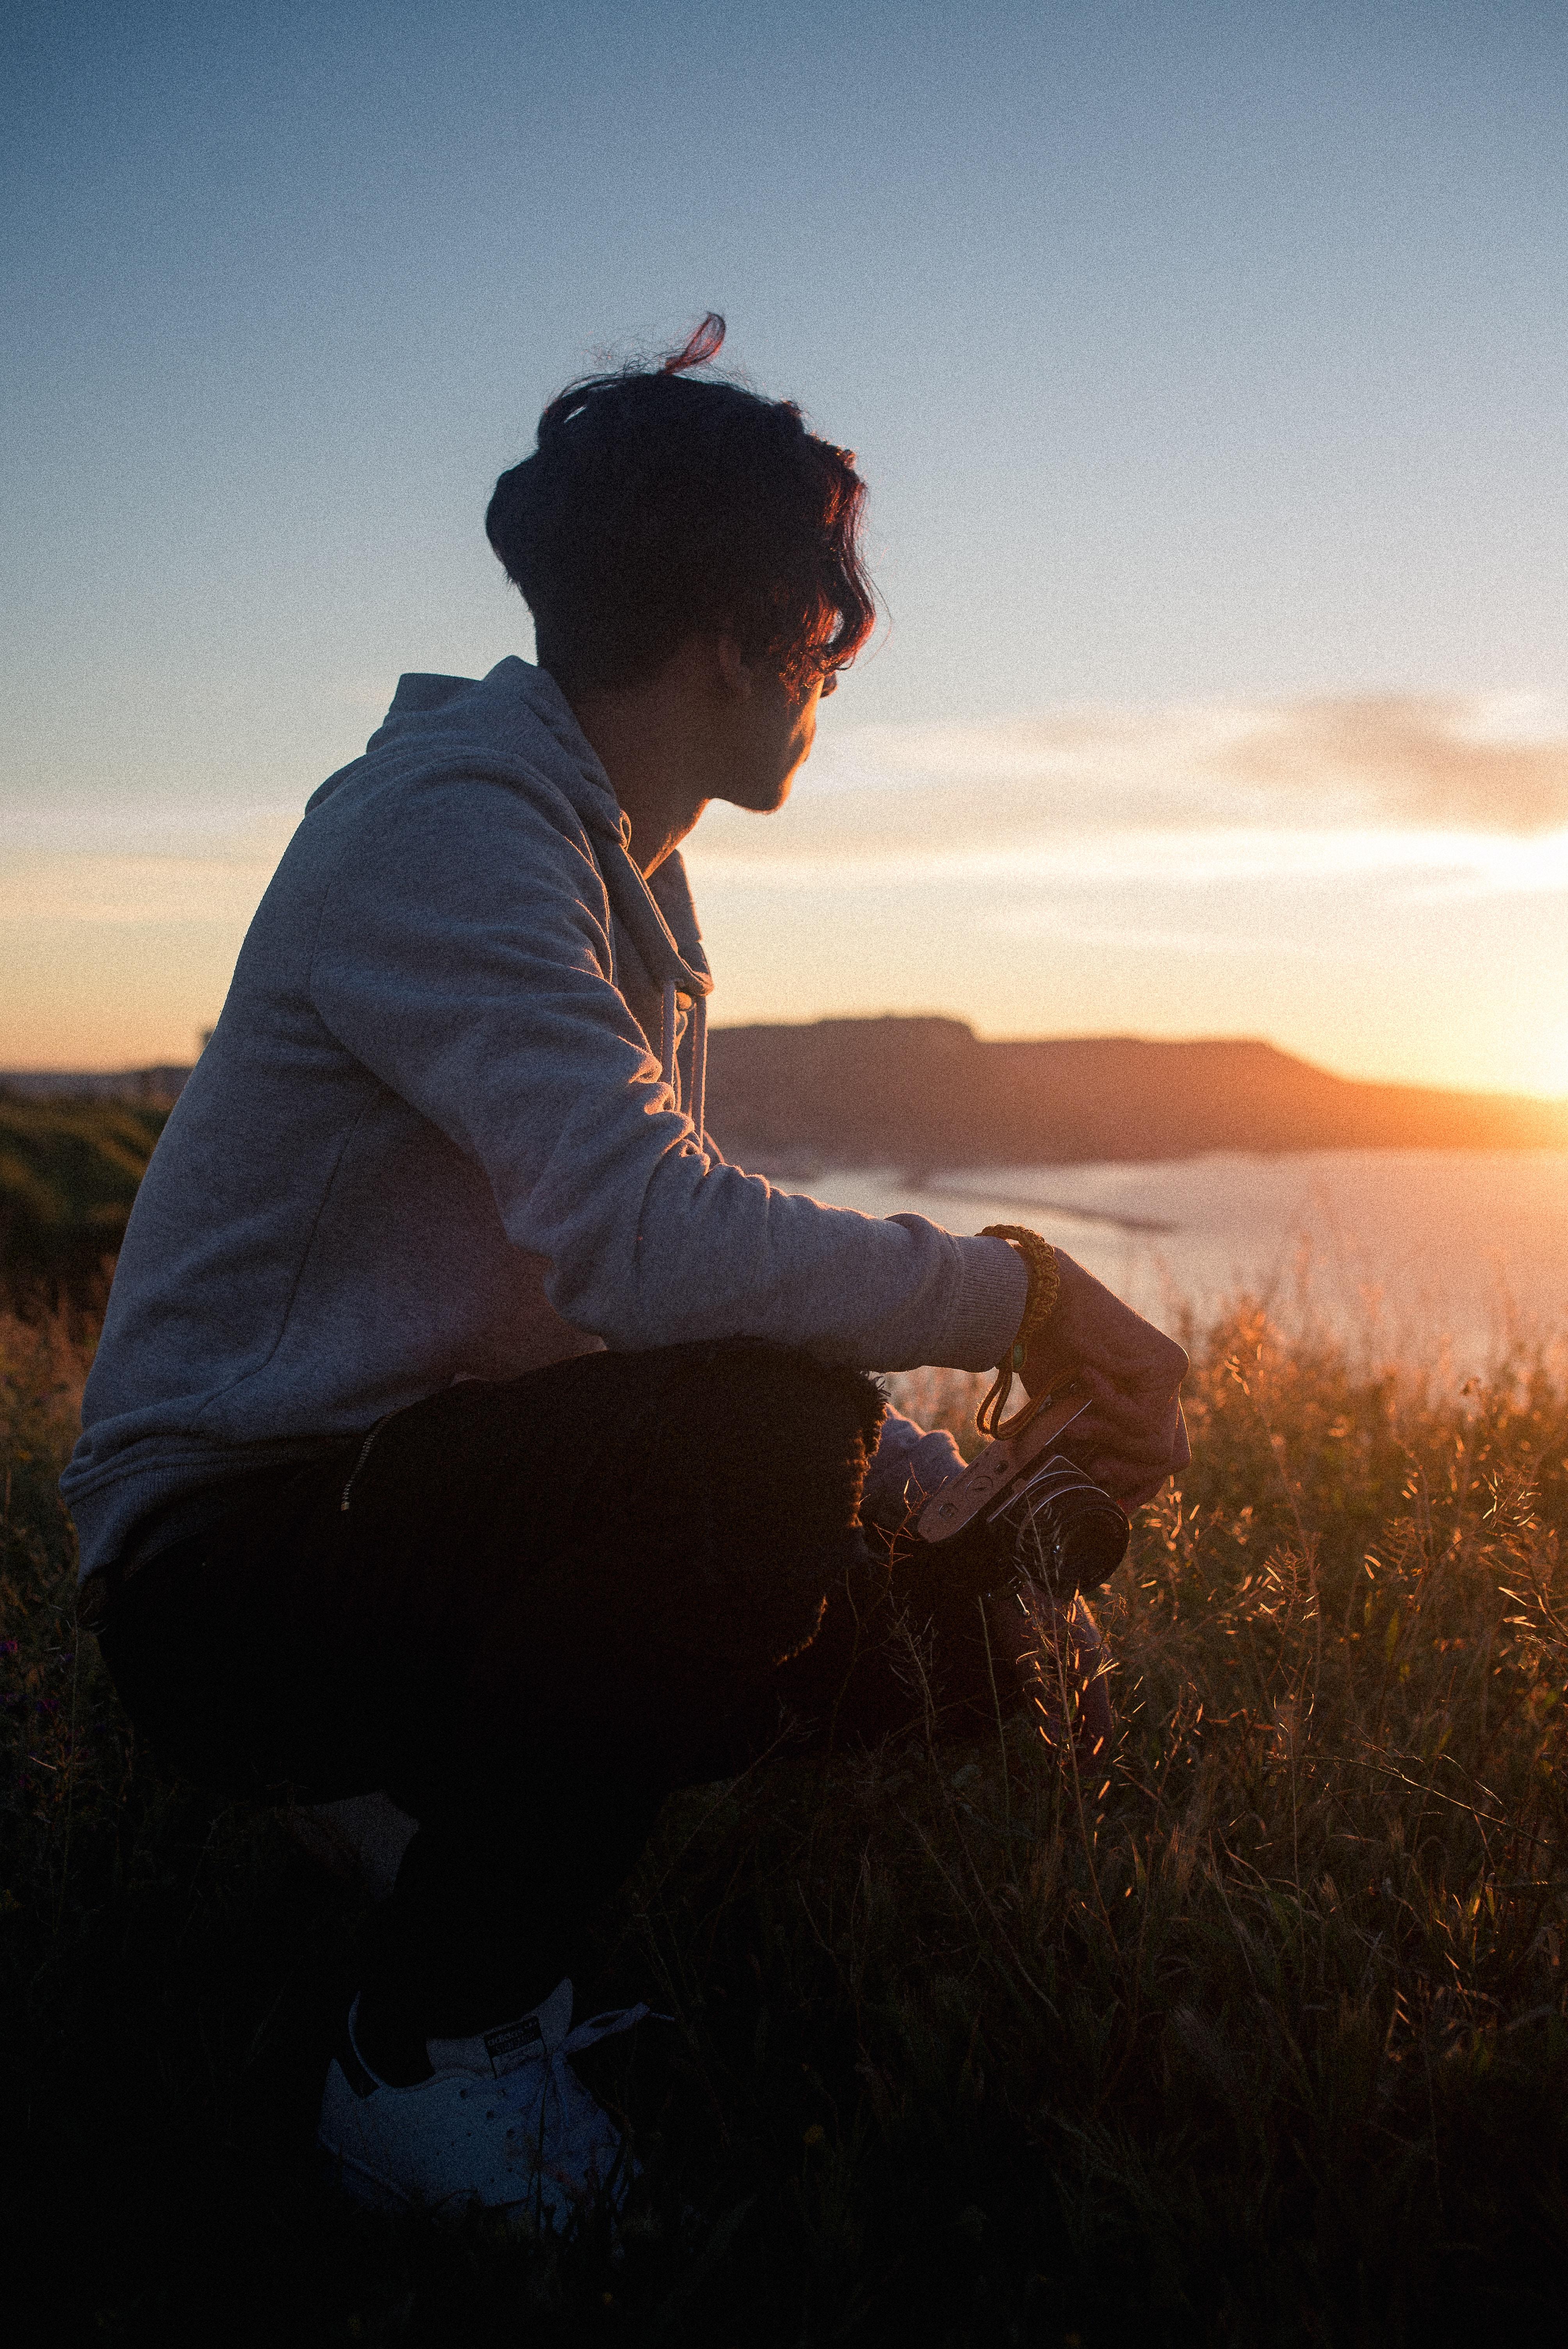 man sitting on rock while holding camera